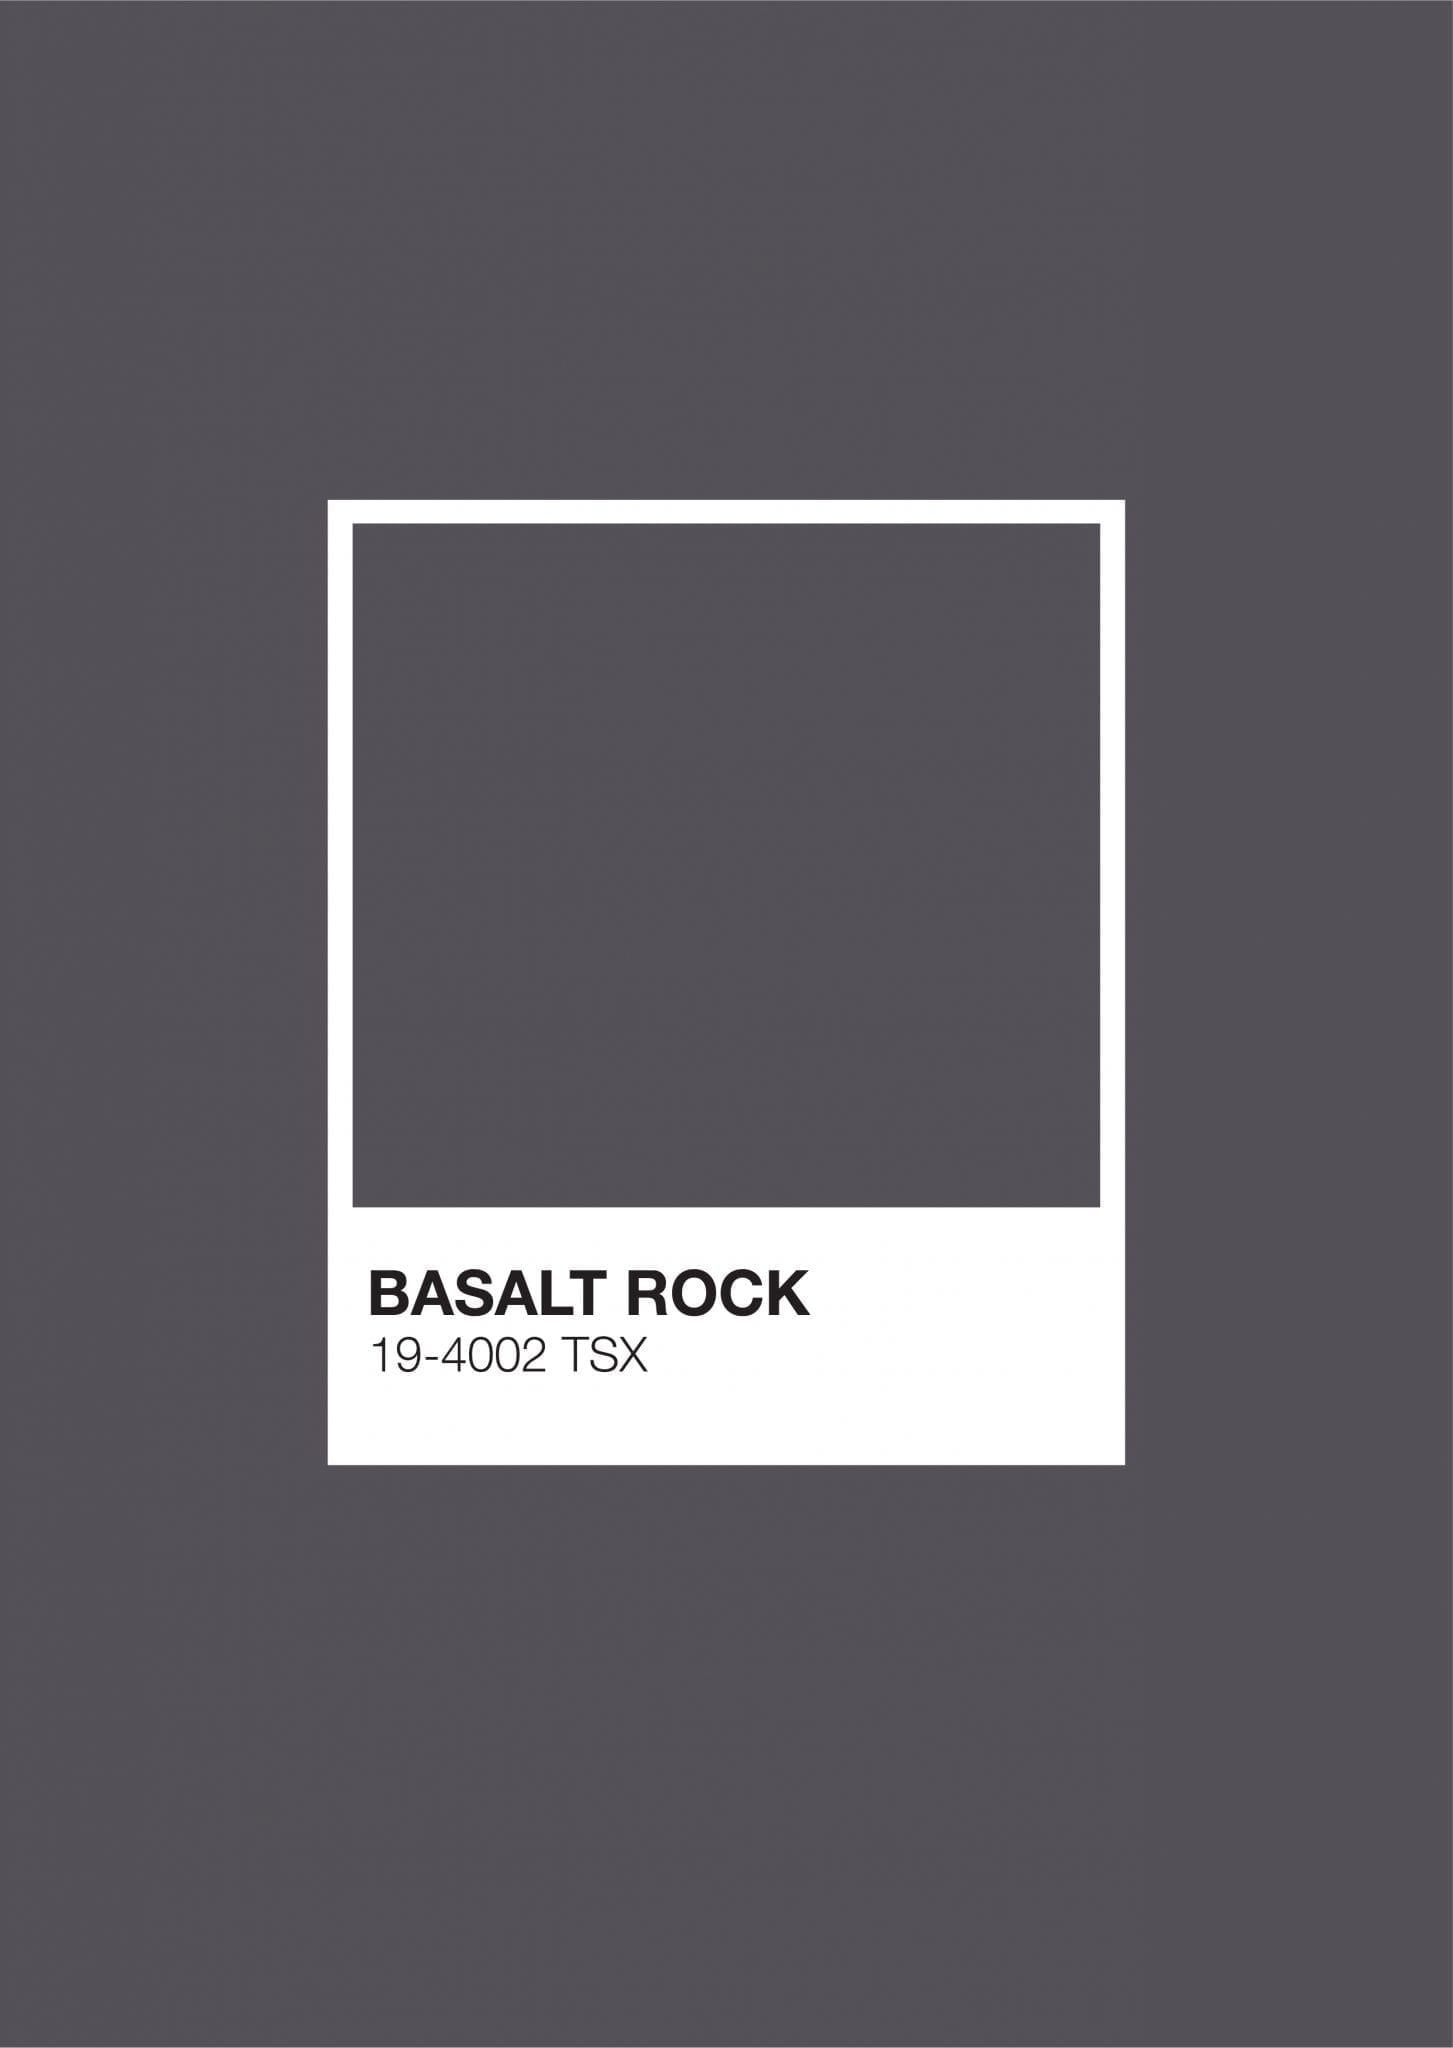 Iceland Pantone: Basalt Rock